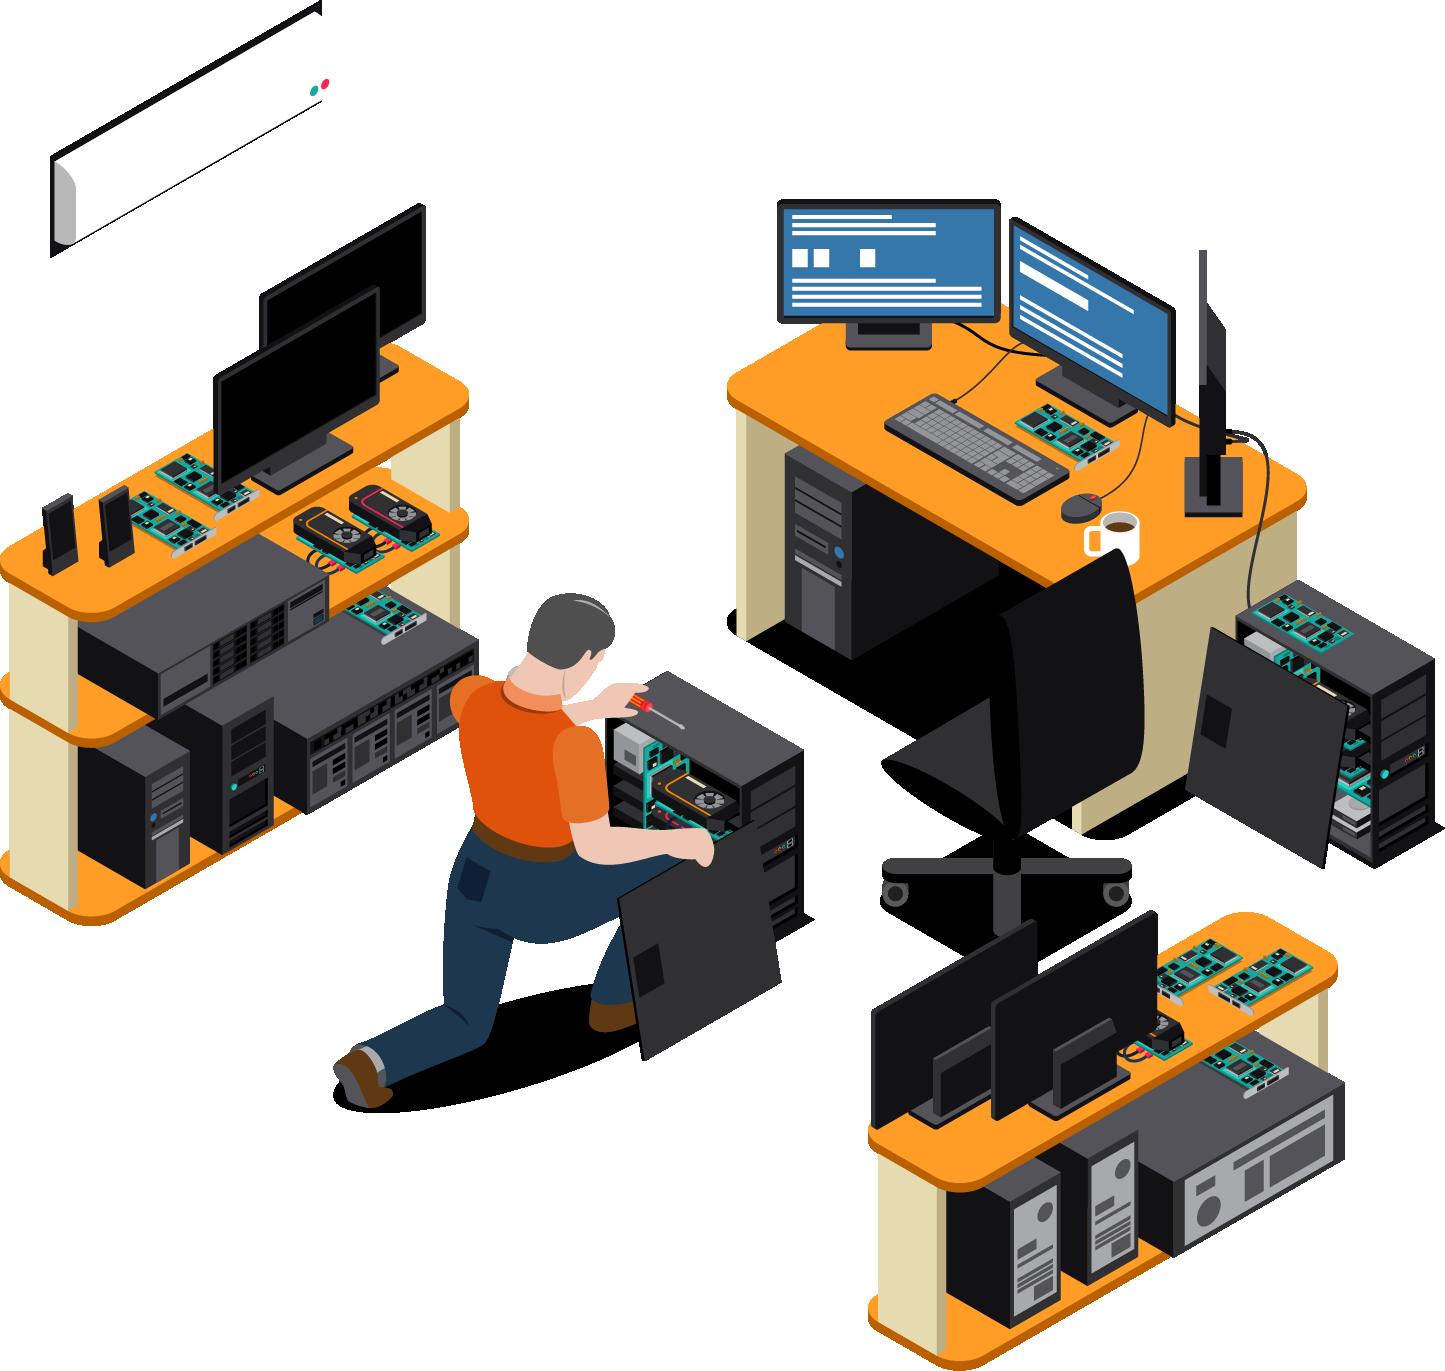 Datacenter networking challenges